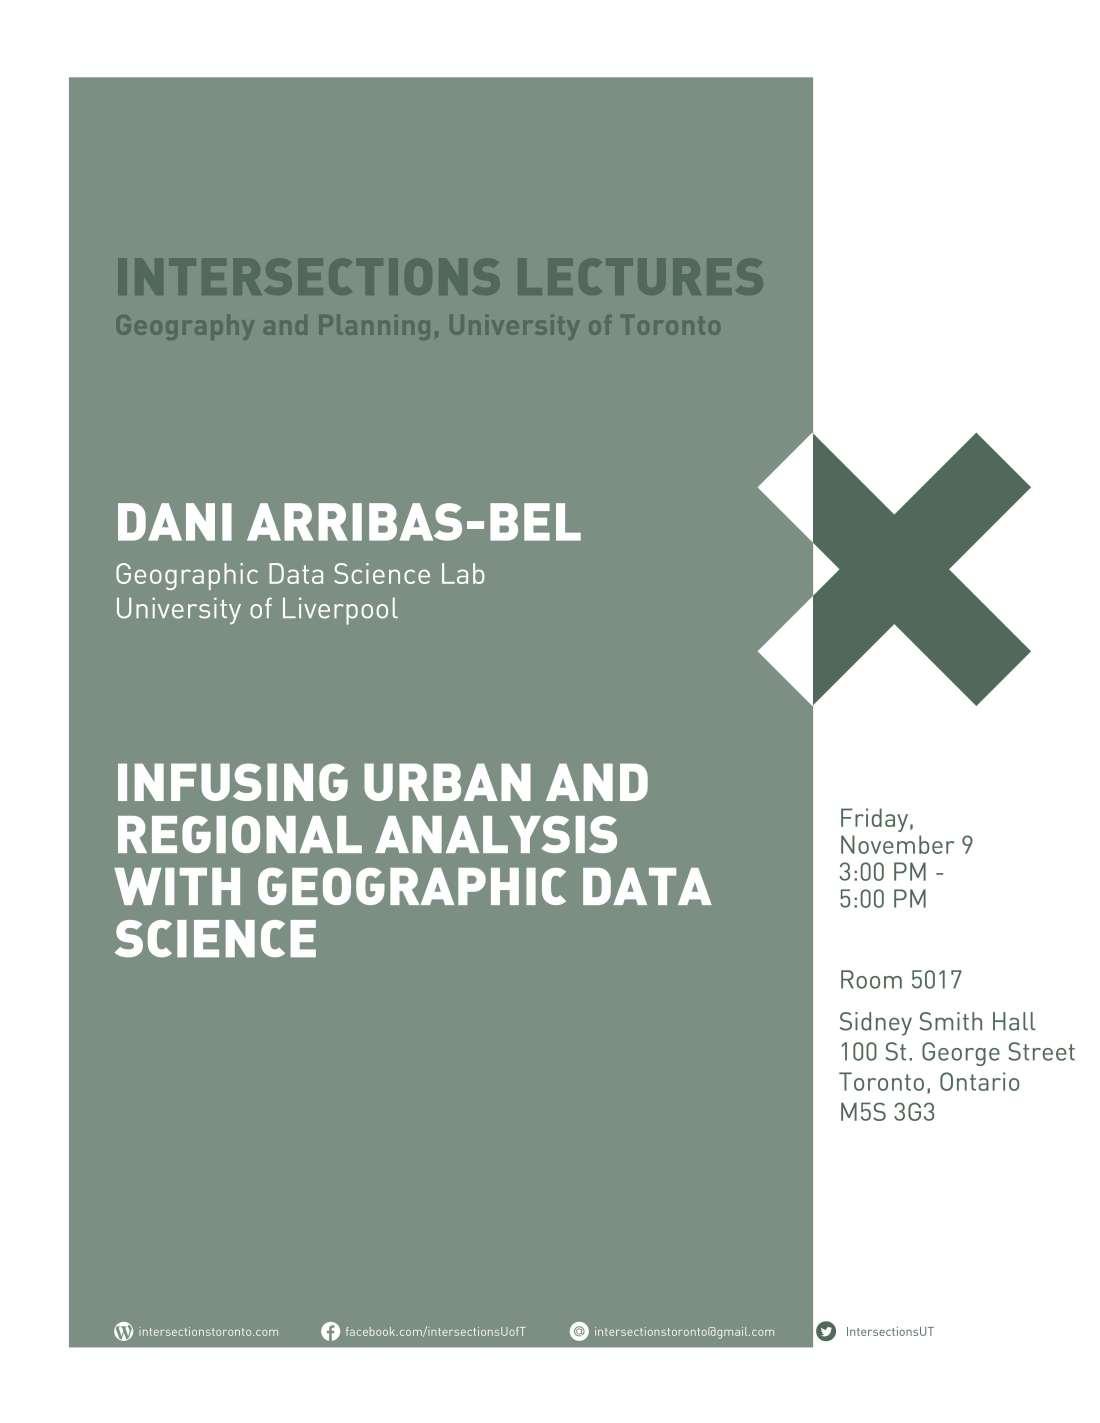 Intersections 2018-19 Posters_Dani Aribas Bel